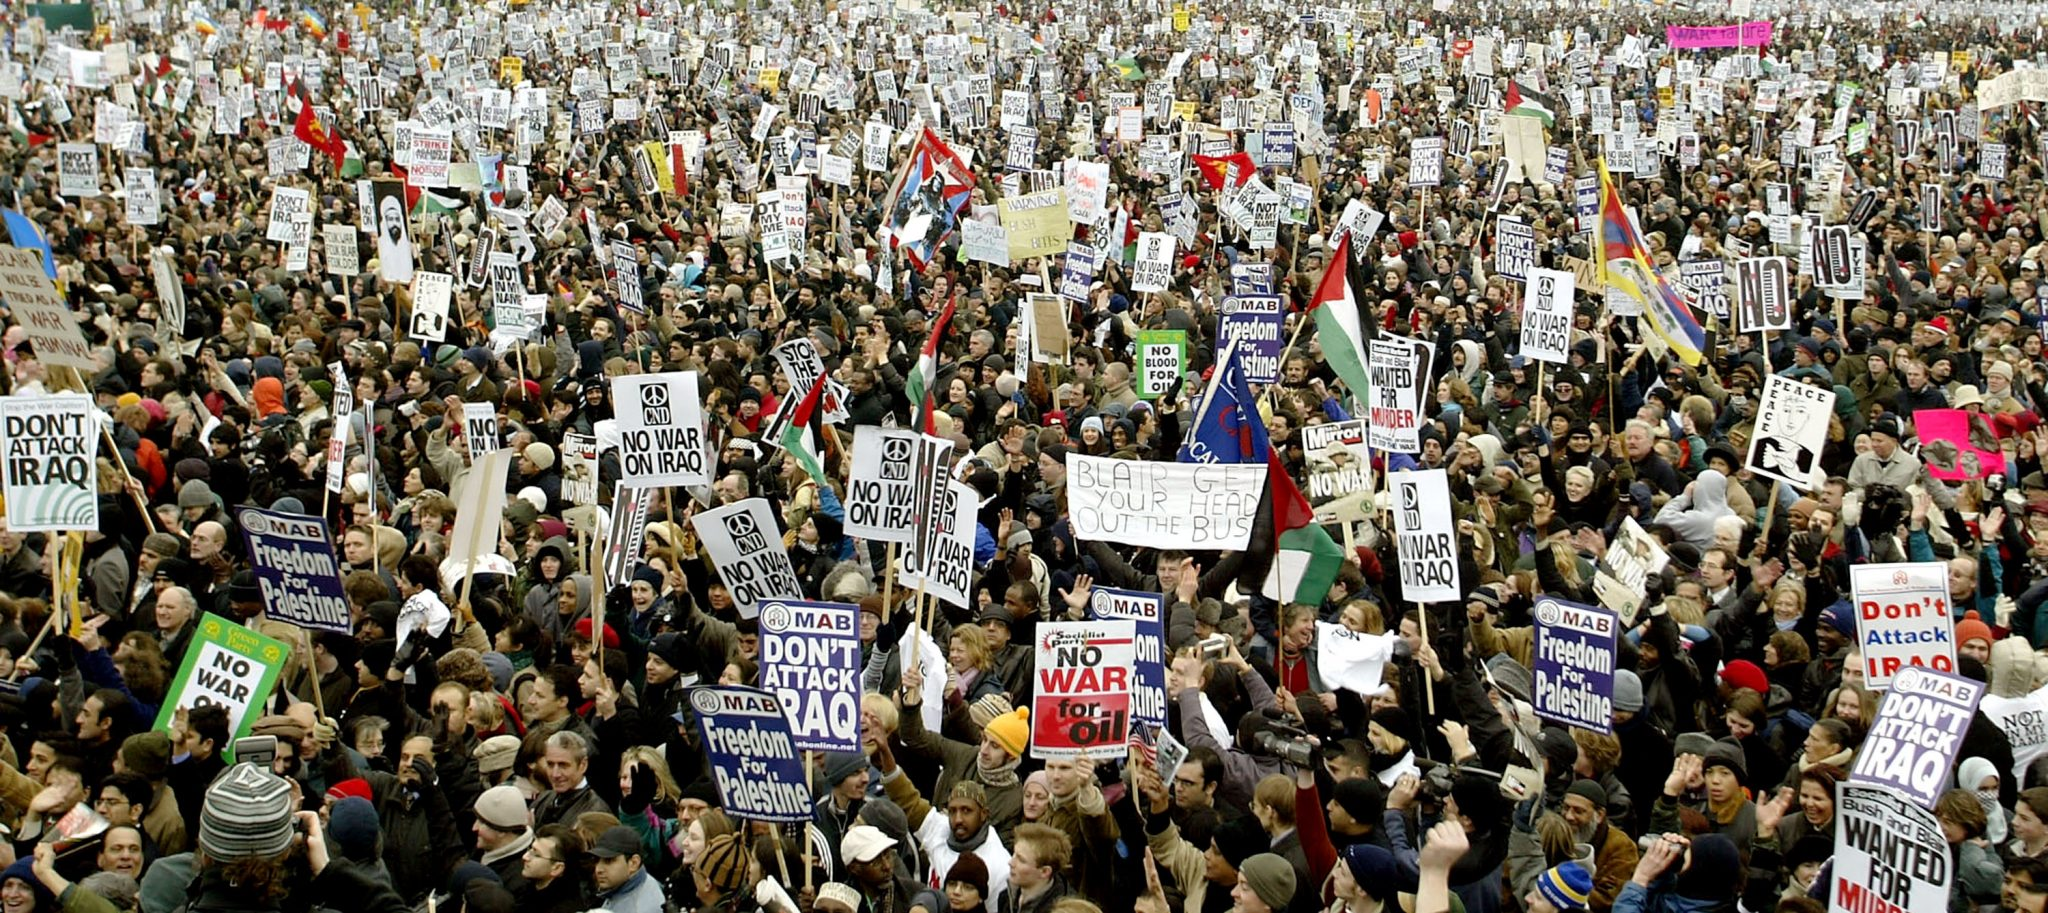 Antiwar Demonstration In London